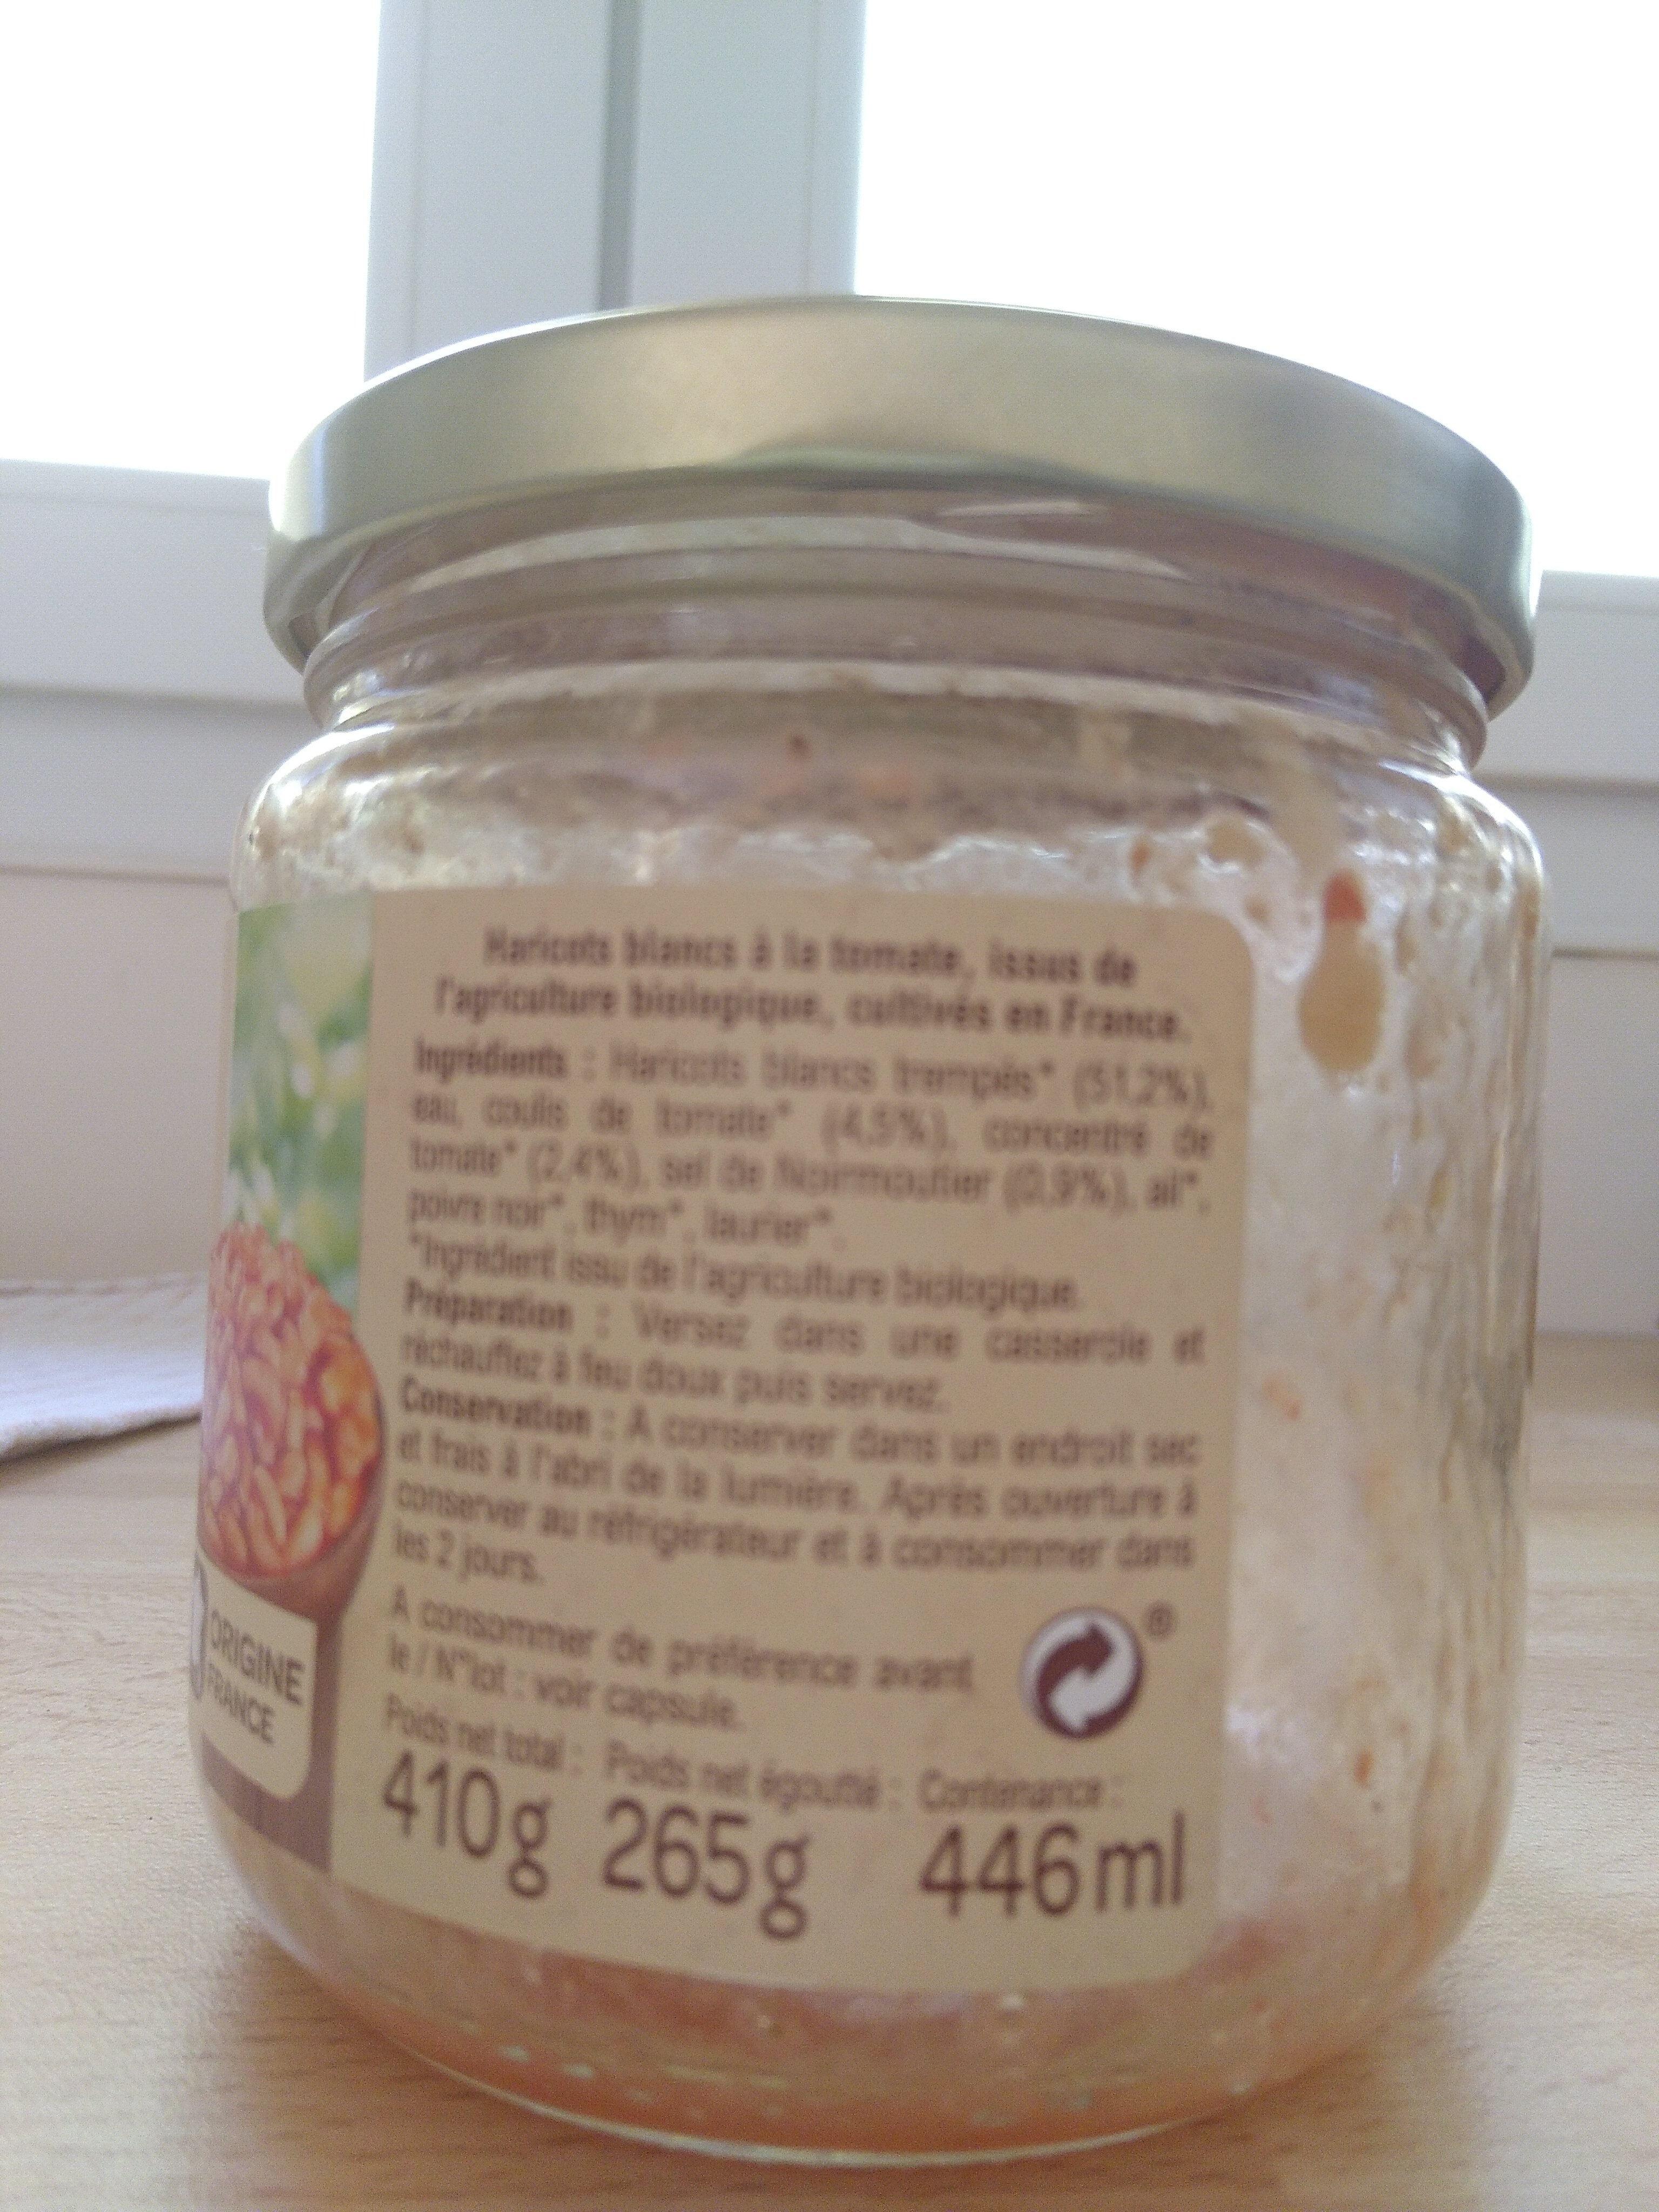 Haricots blancs à la tomate - Prodotto - fr